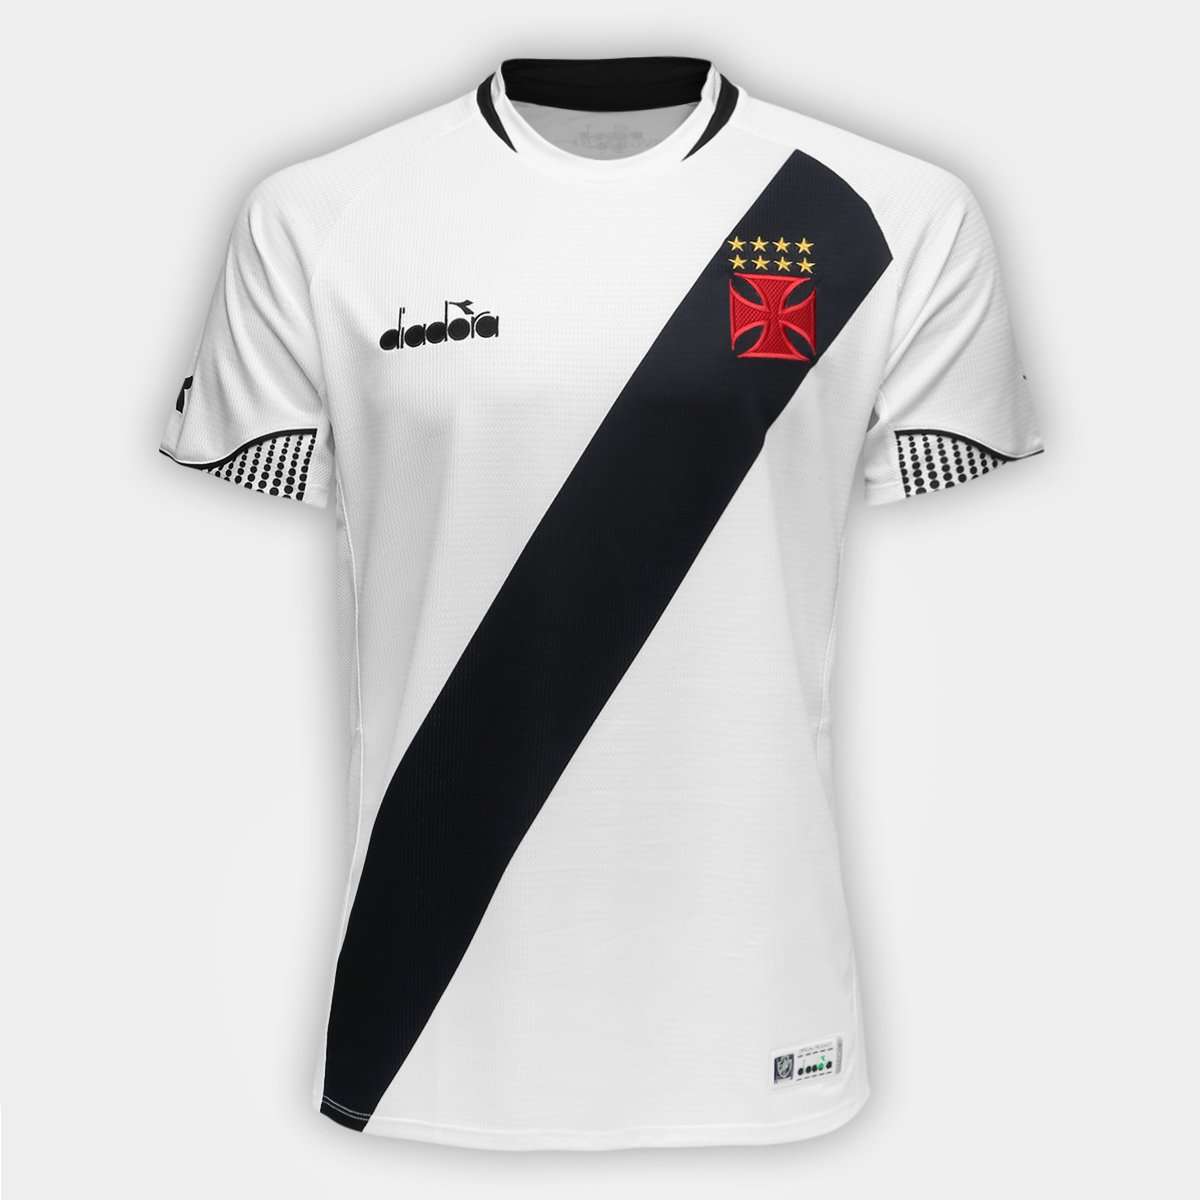 438115a469 ... Camisa Vasco II 2018 Nº 11 - Maxi - Torcedor Diadora Masculina ...